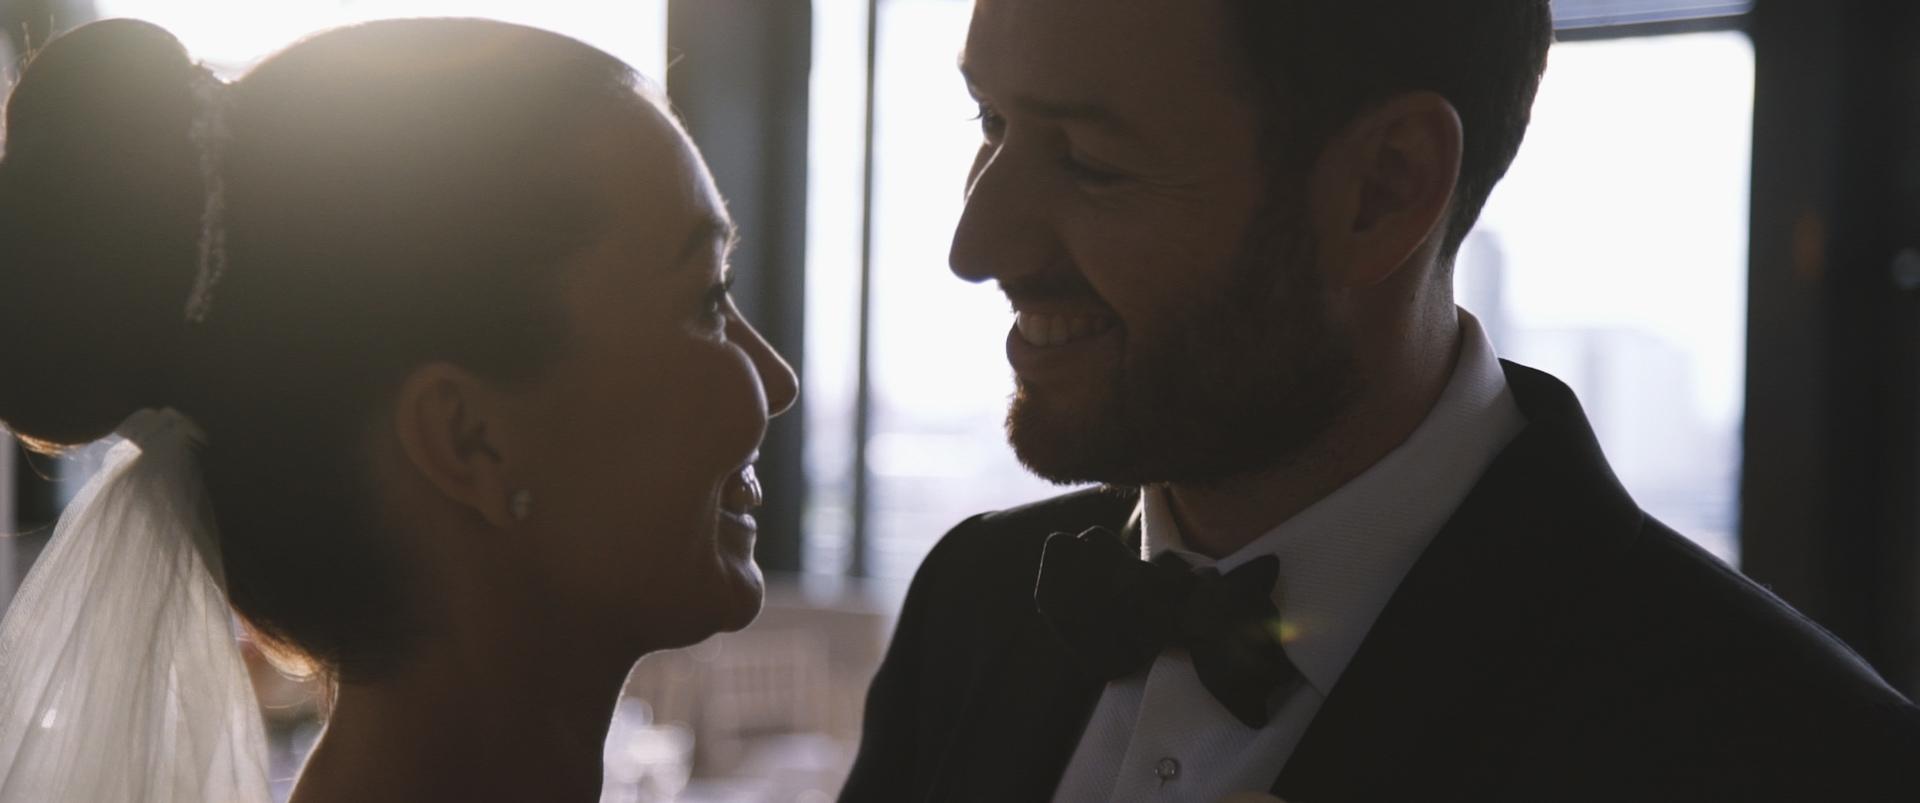 jerome and ebony wedding videography melbourne